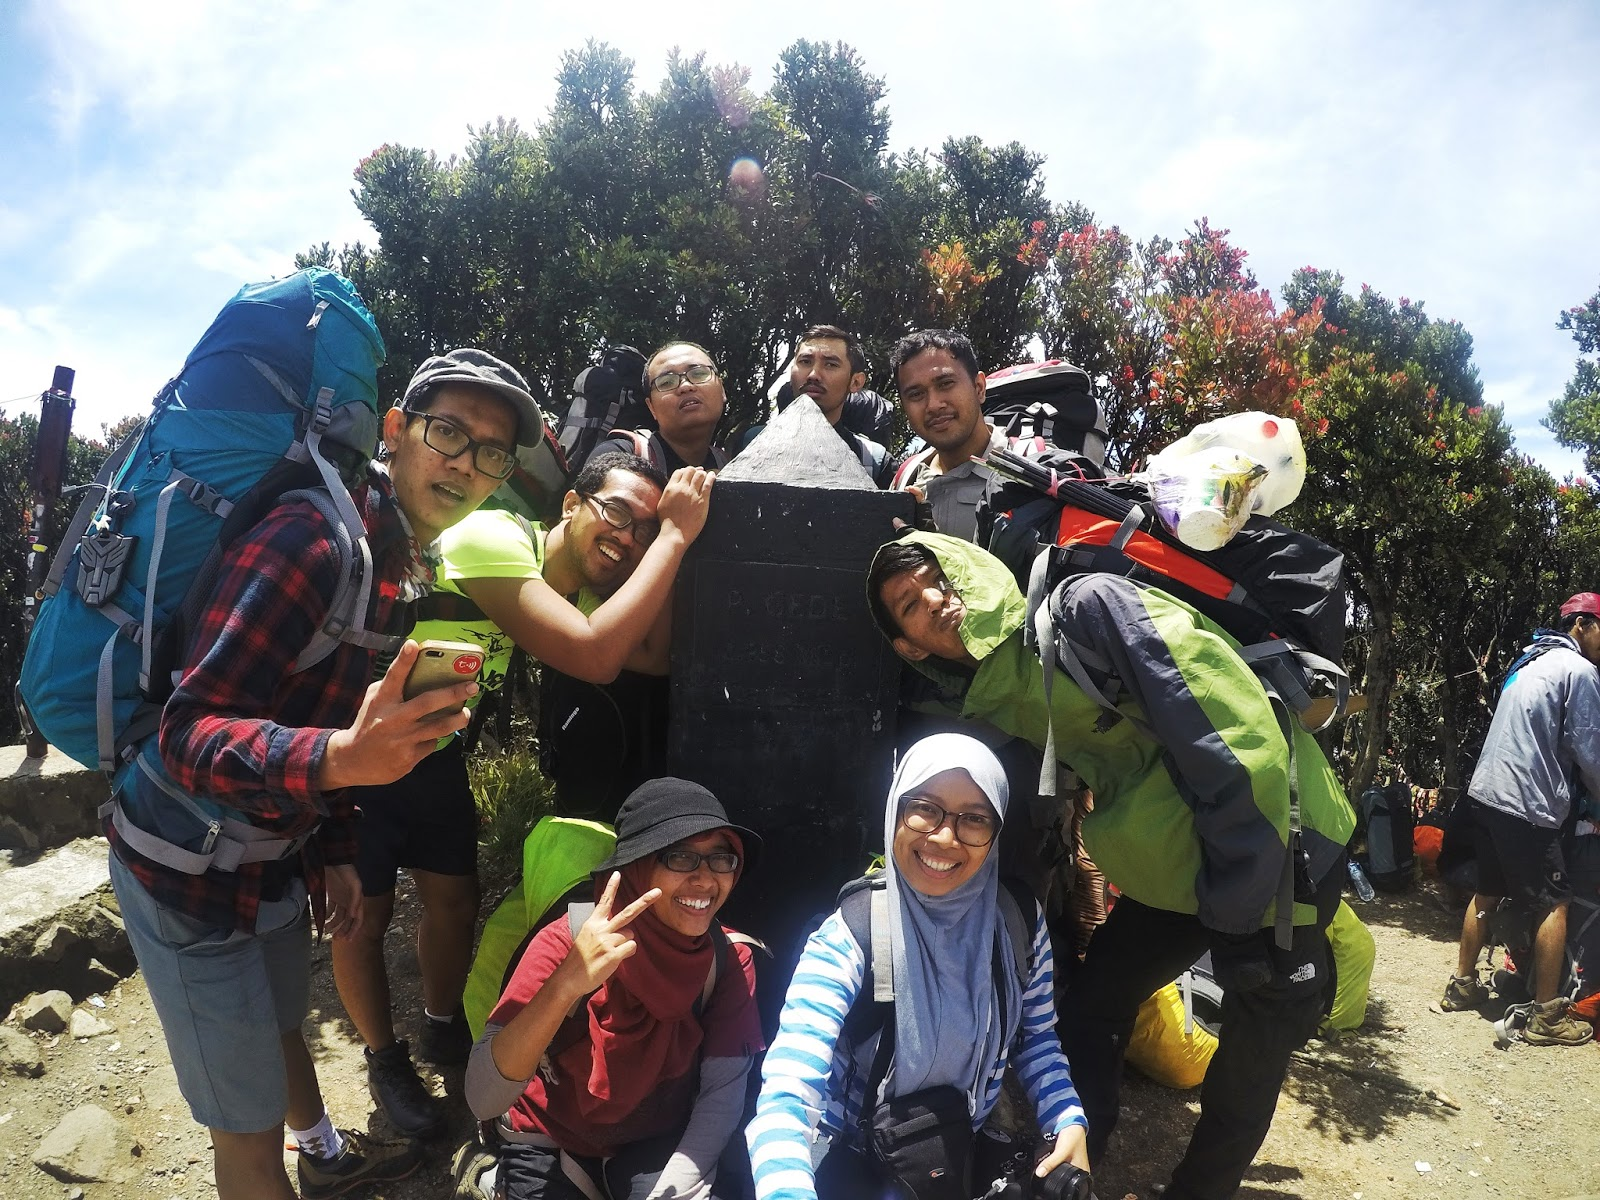 Monumen Gunung Gede